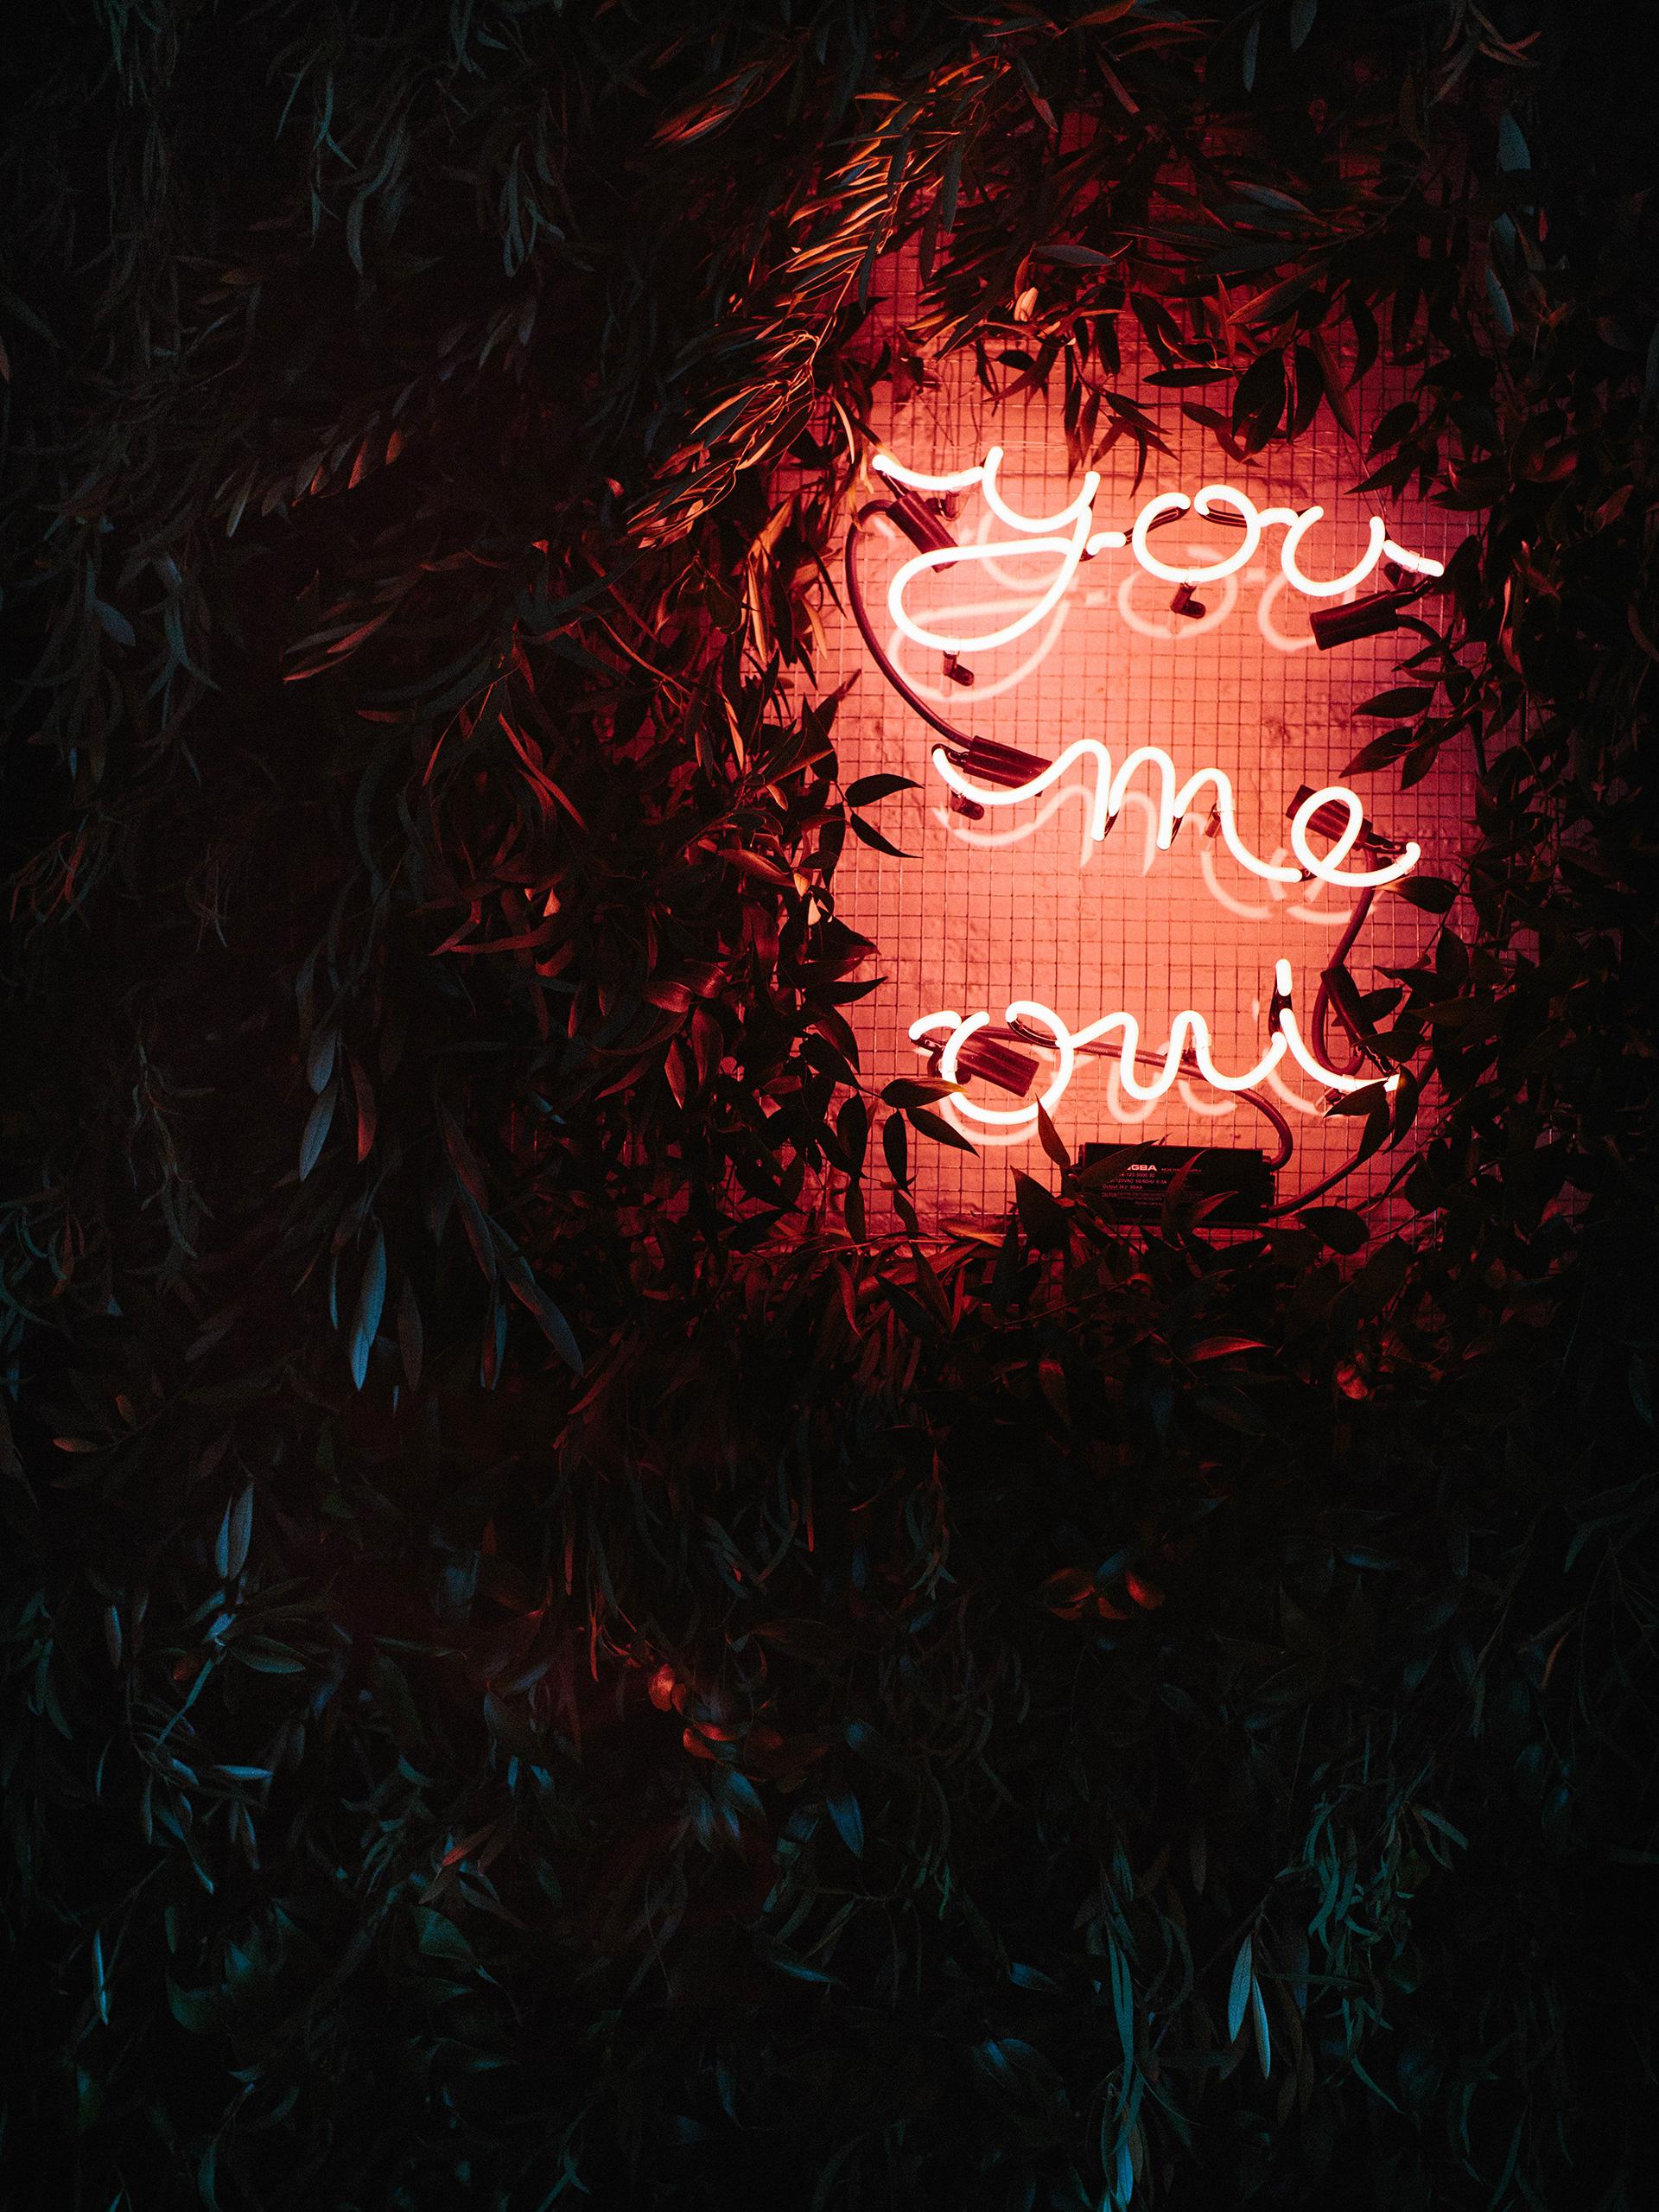 joanna jay wedding backdrop neon